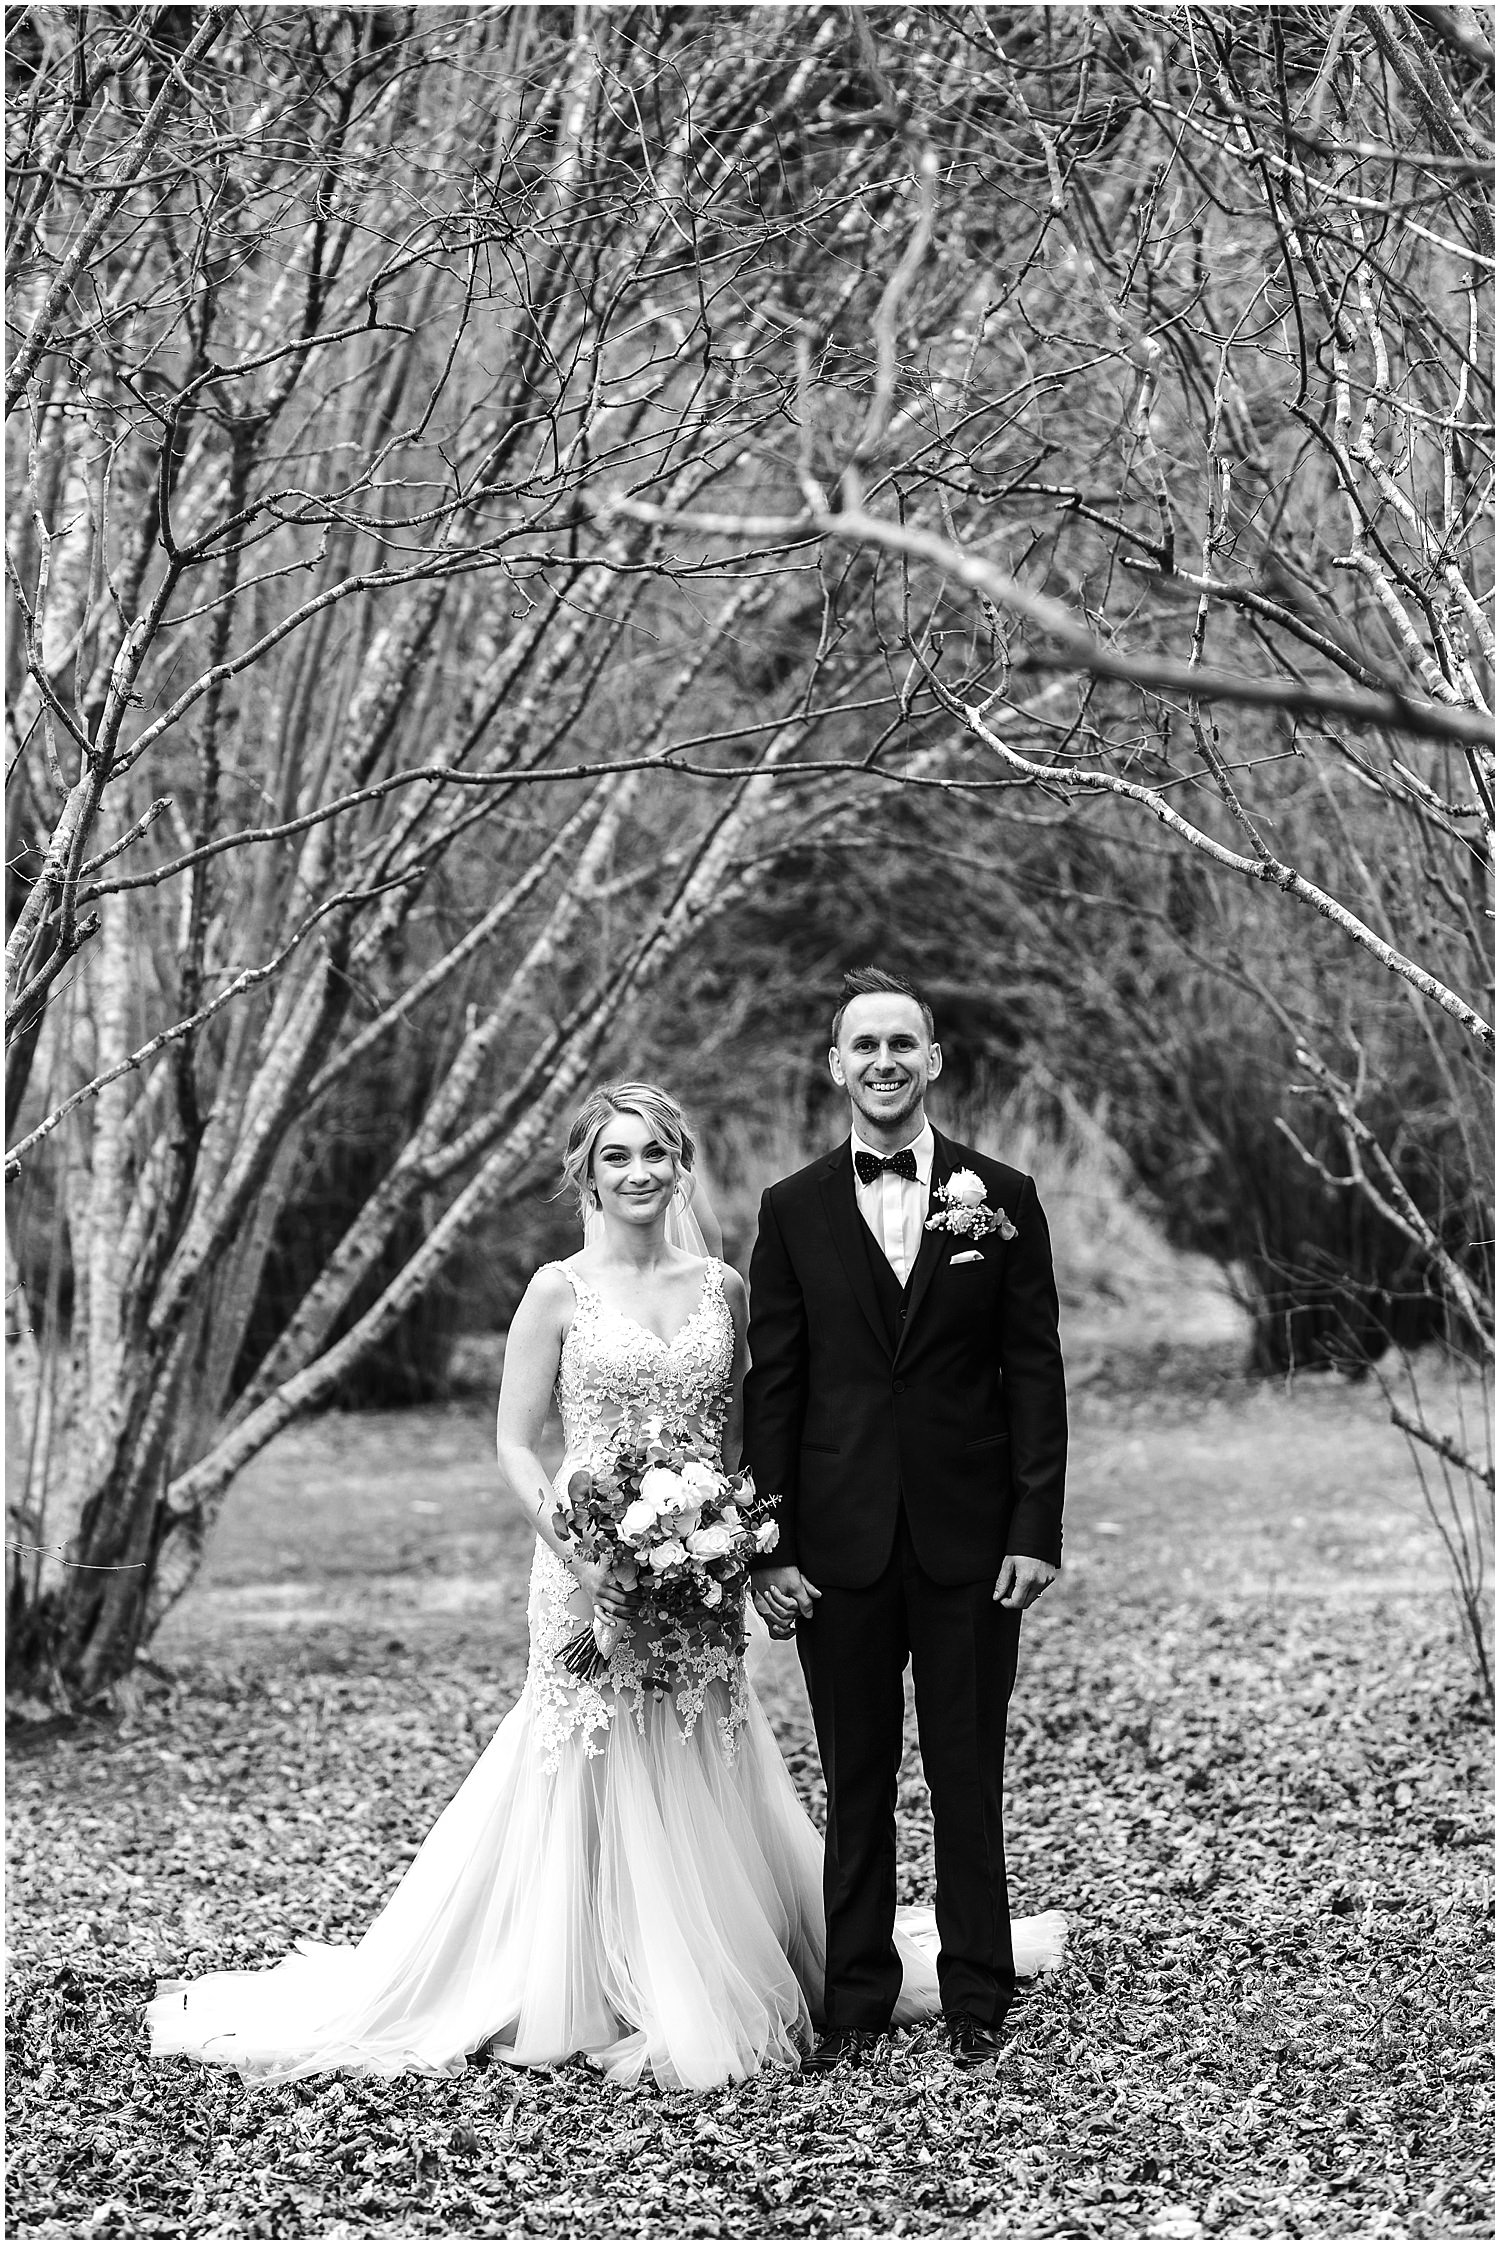 dominique-guy-montrose-berry-farm-wedding-_0048.jpg